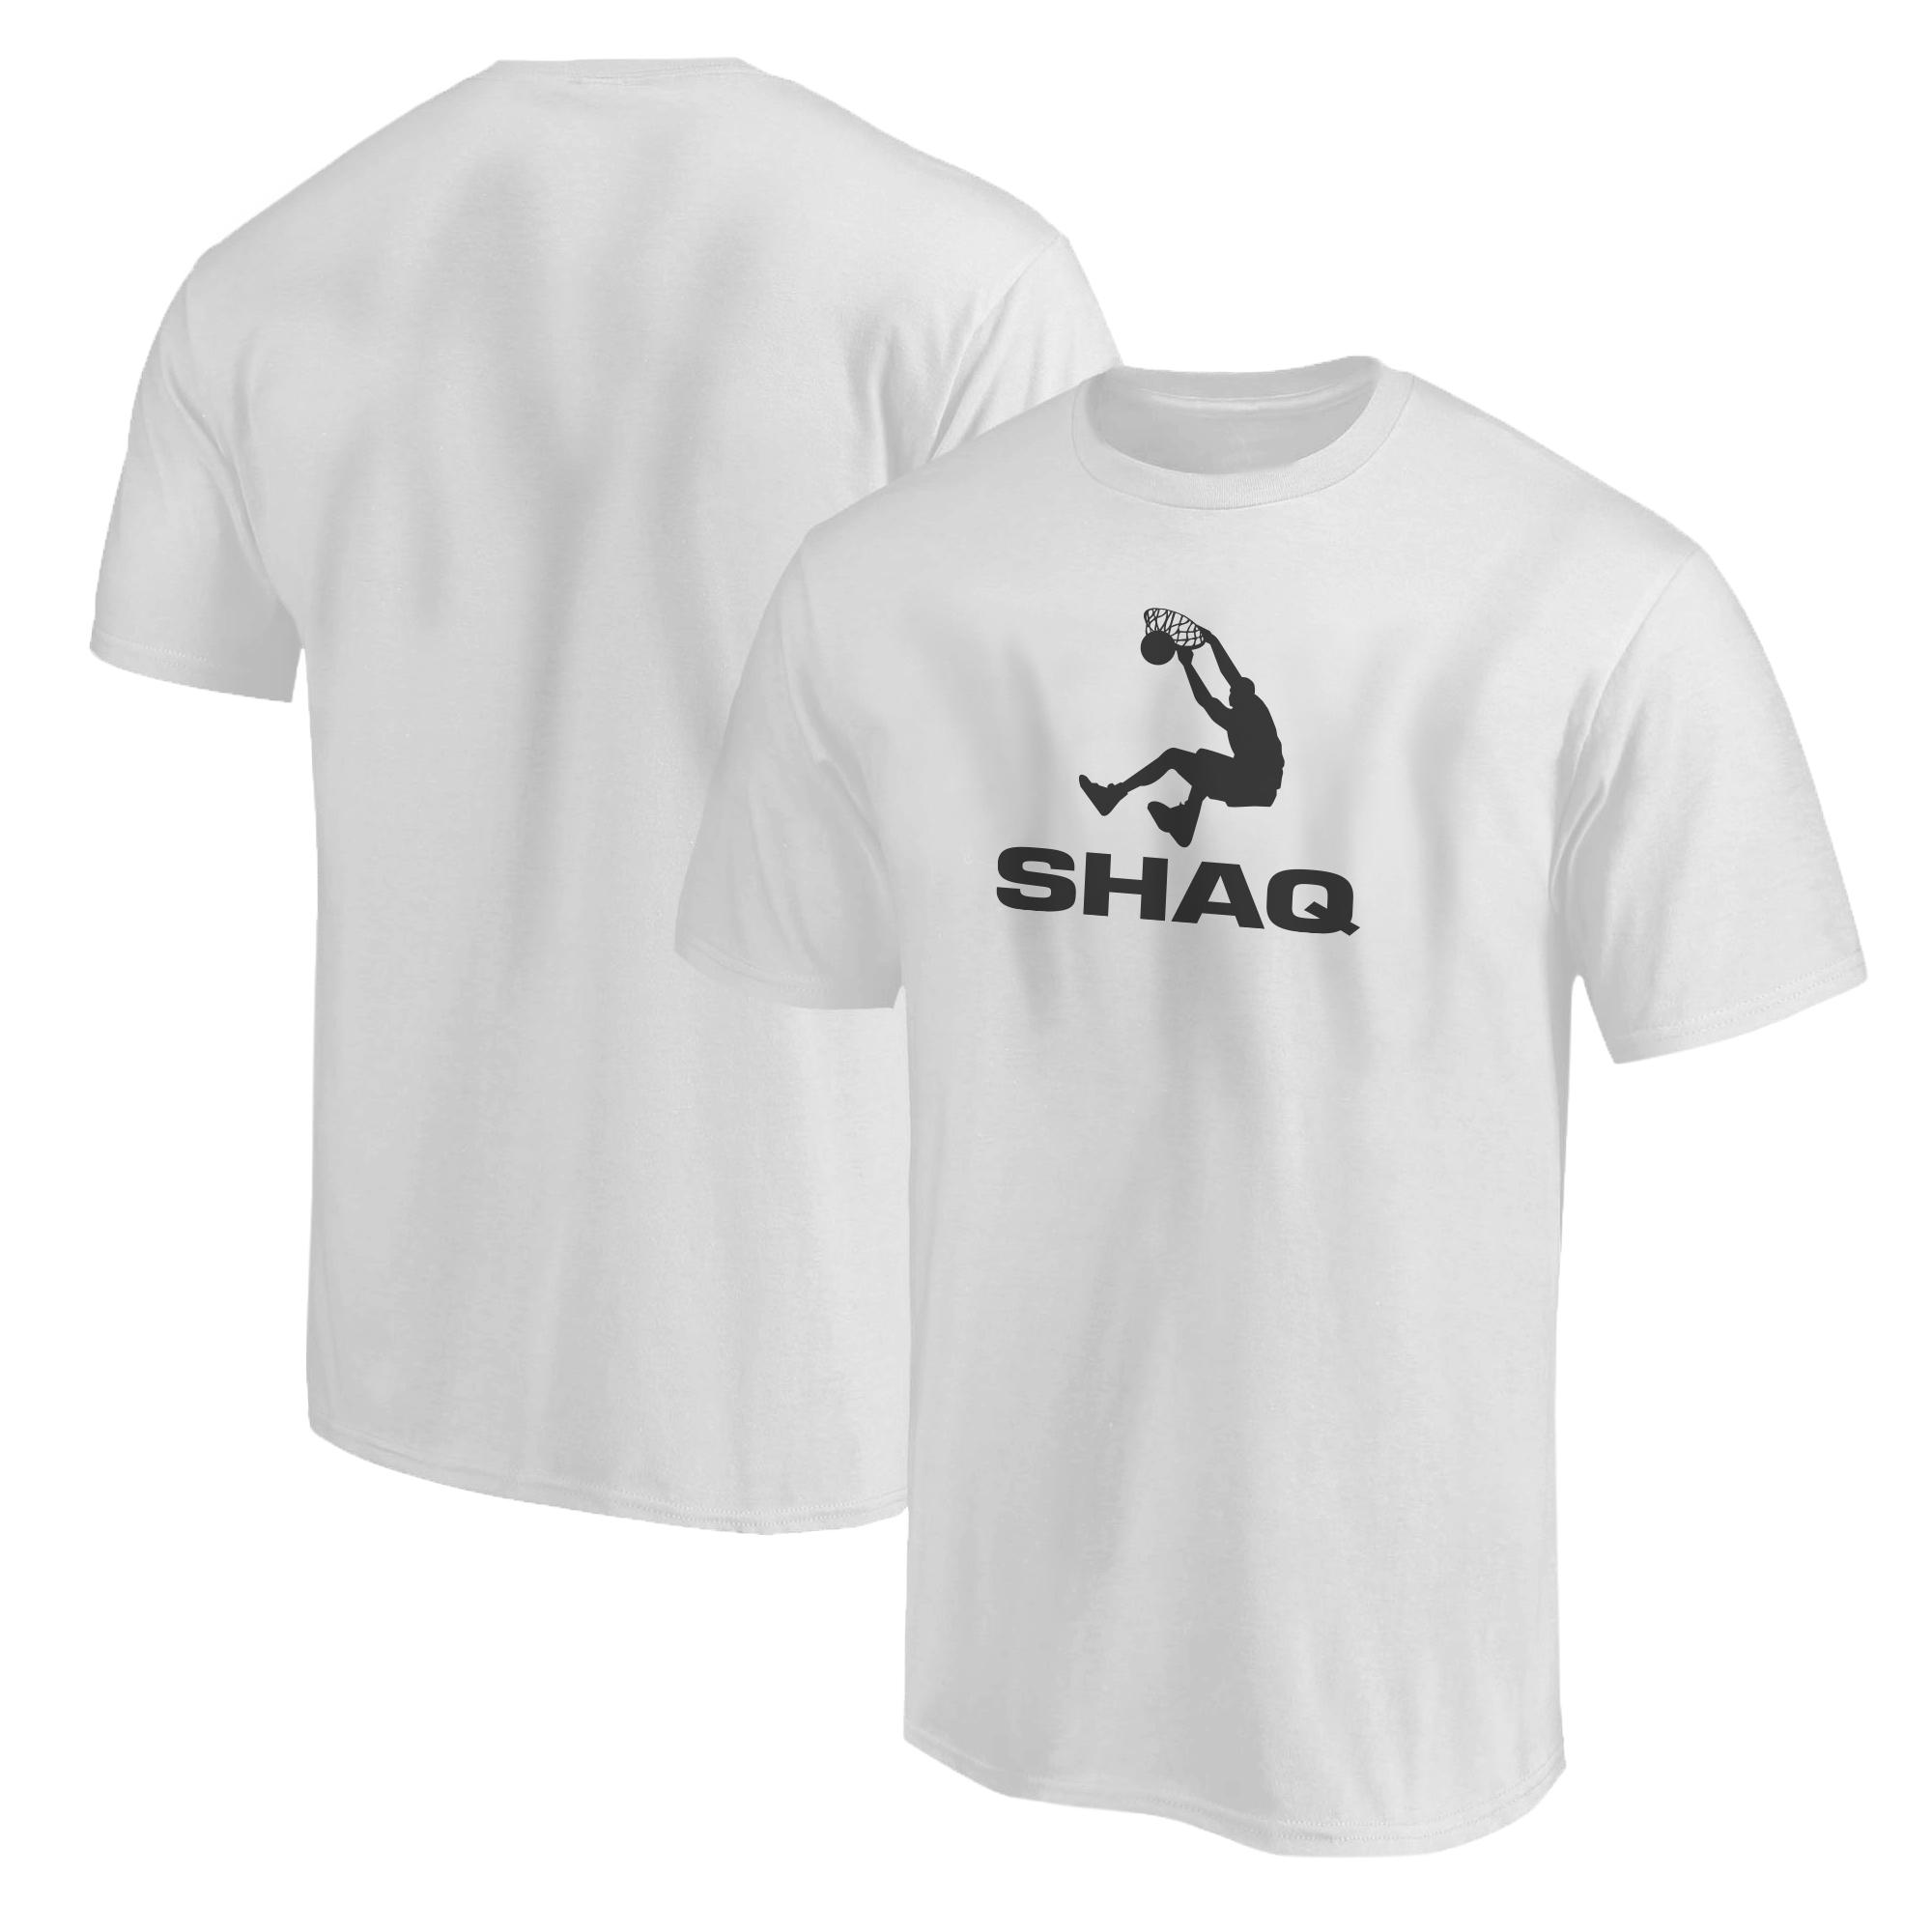 Shaquille O'Neal Tshirt (TSH-WHT-NP-392-ShaquilleO'Neal)